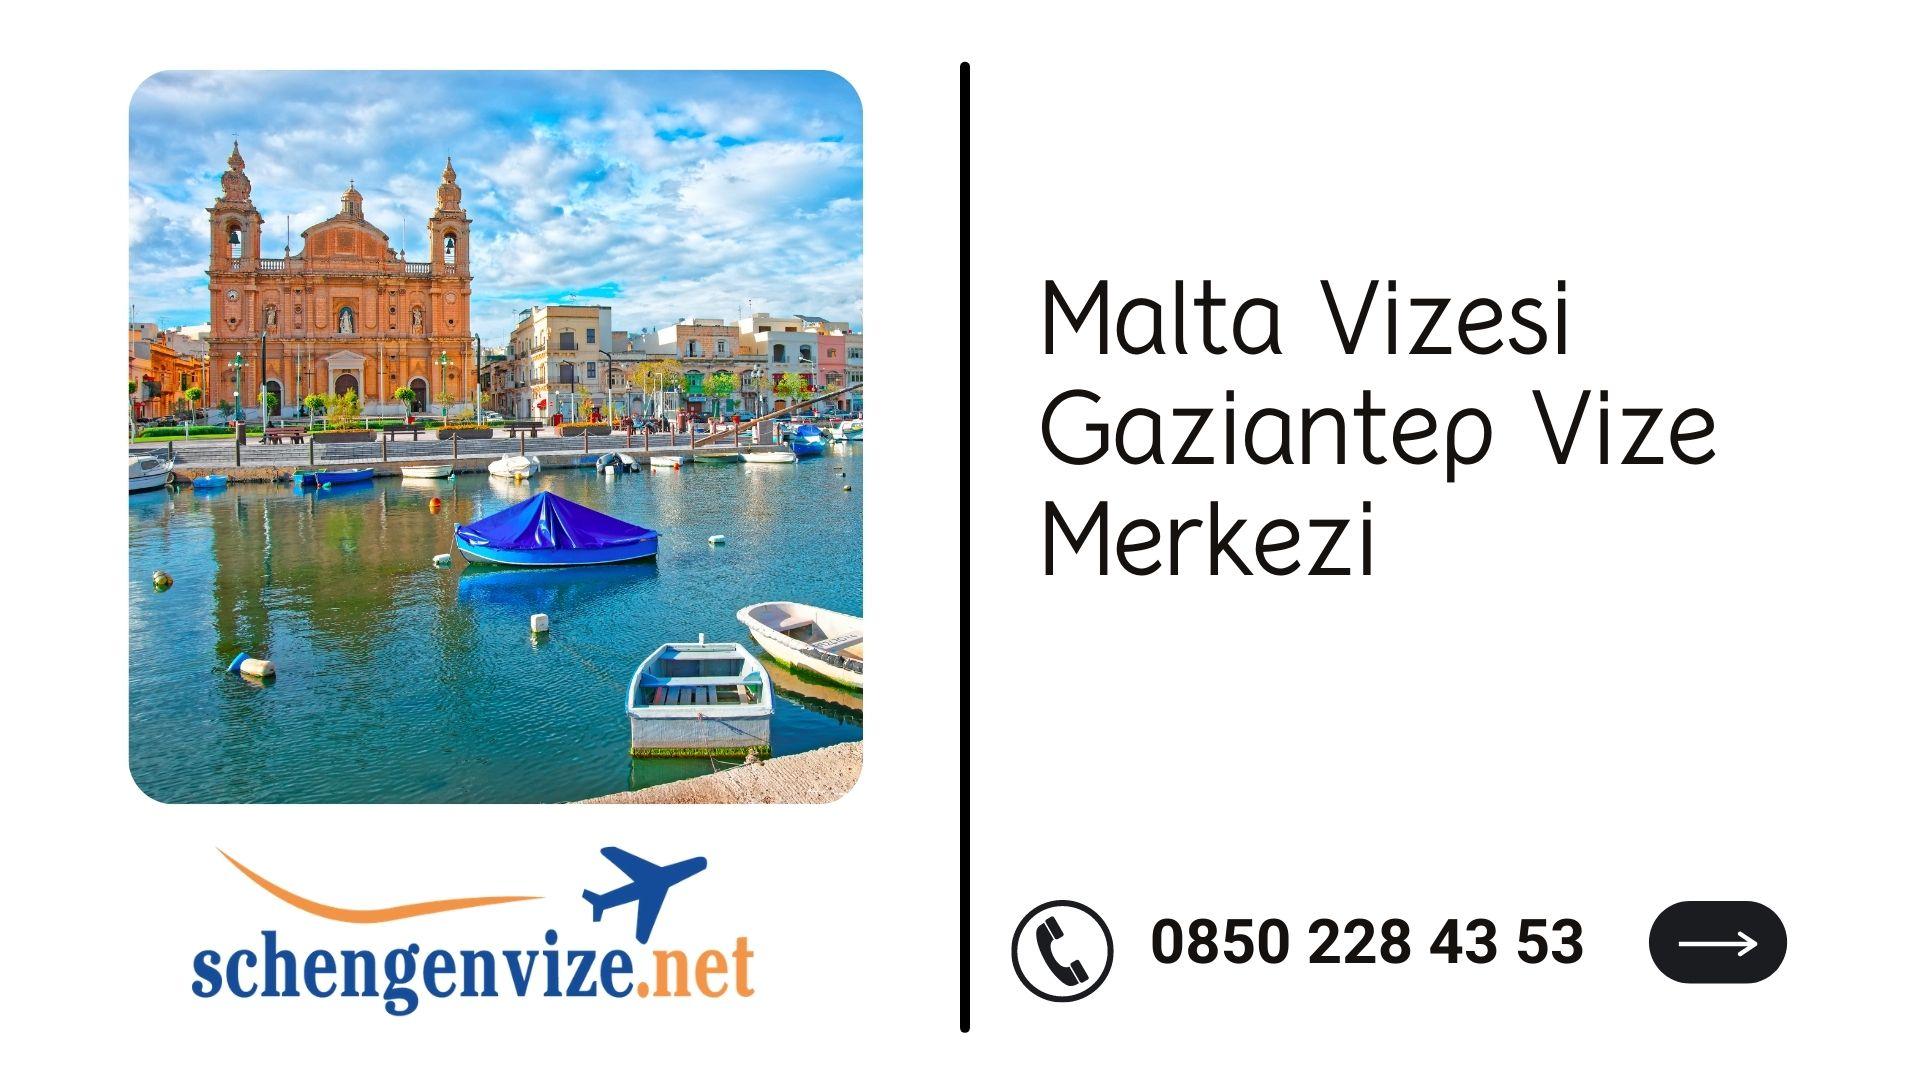 Malta Vizesi Gaziantep Vize Merkezi